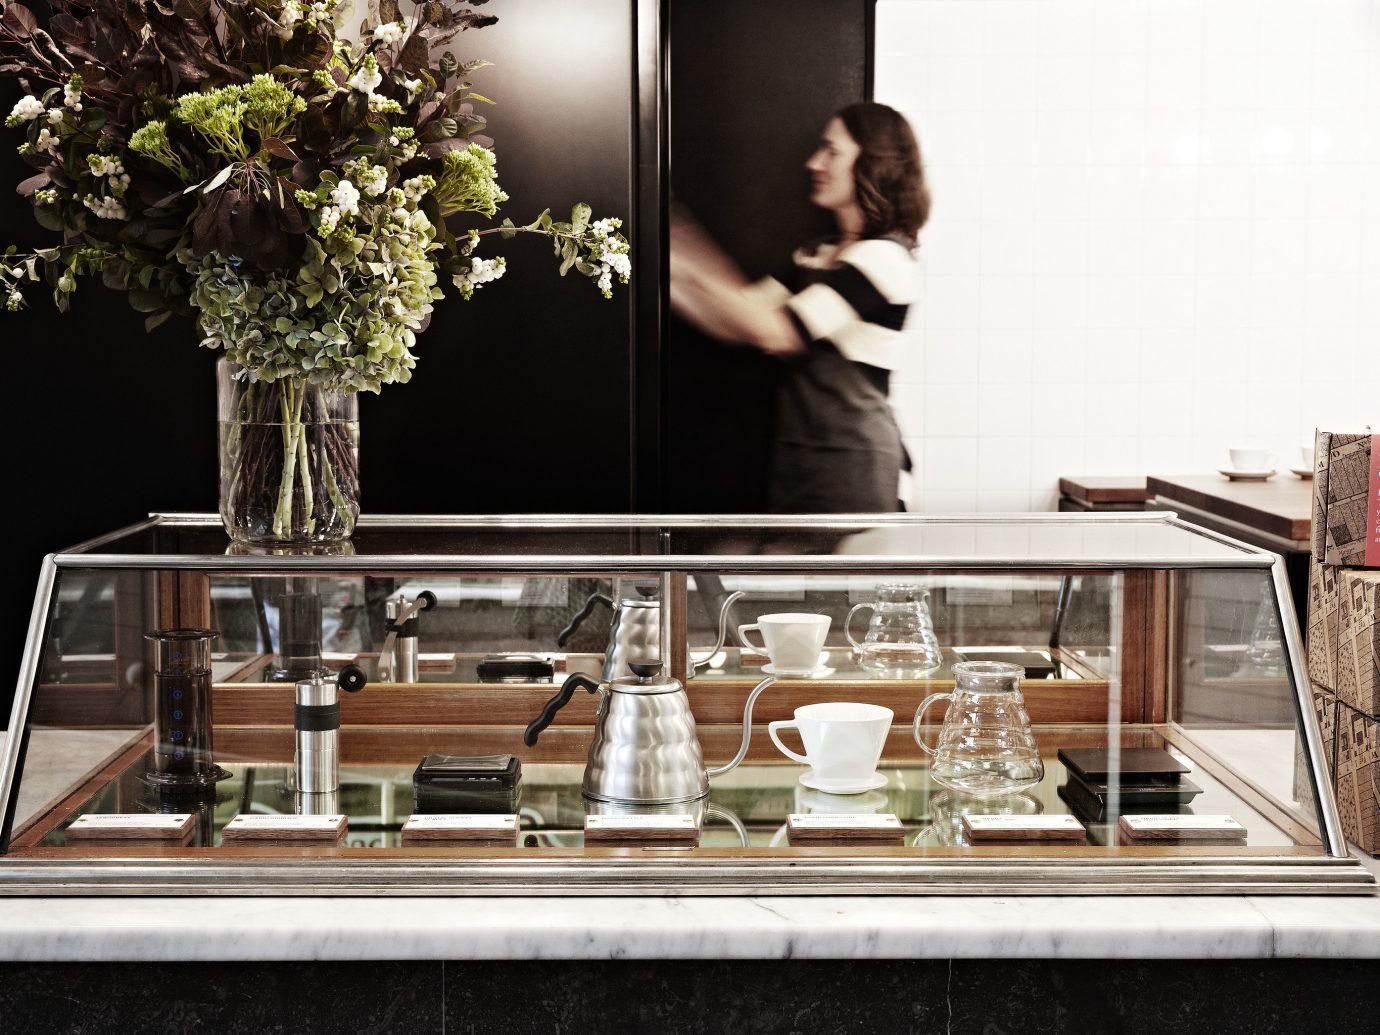 City Food + Drink Melbourne Outdoors + Adventure indoor furniture table desk